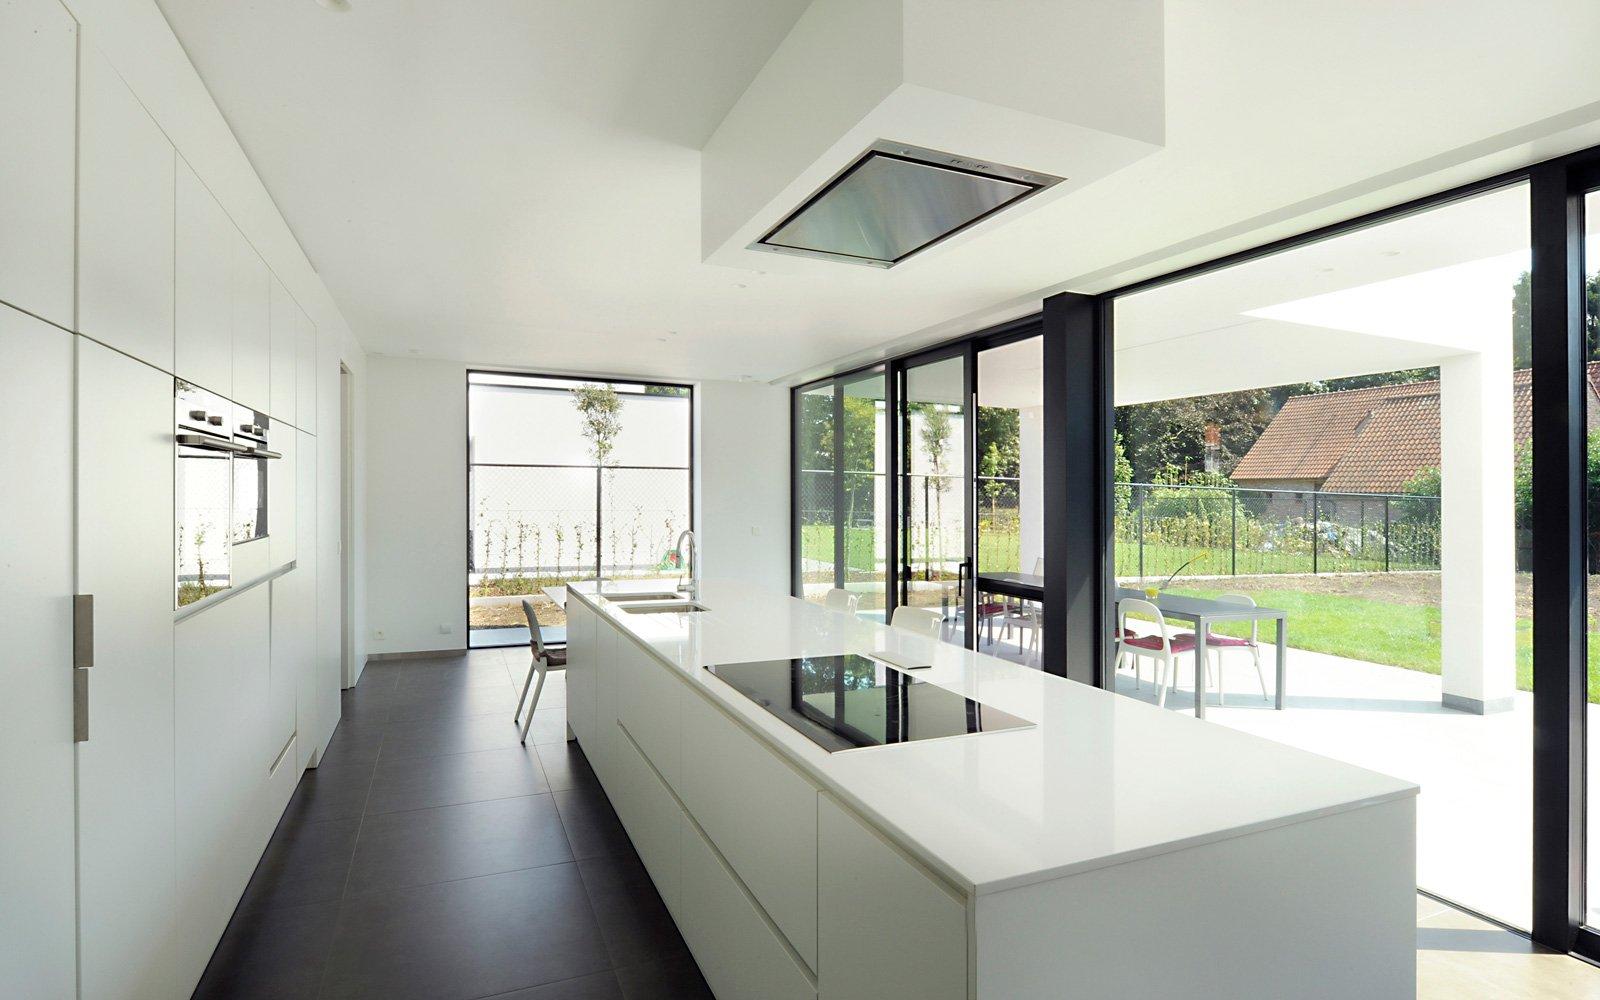 Keuken Aan Tuin : Blokstijl ch architecten the art of living be